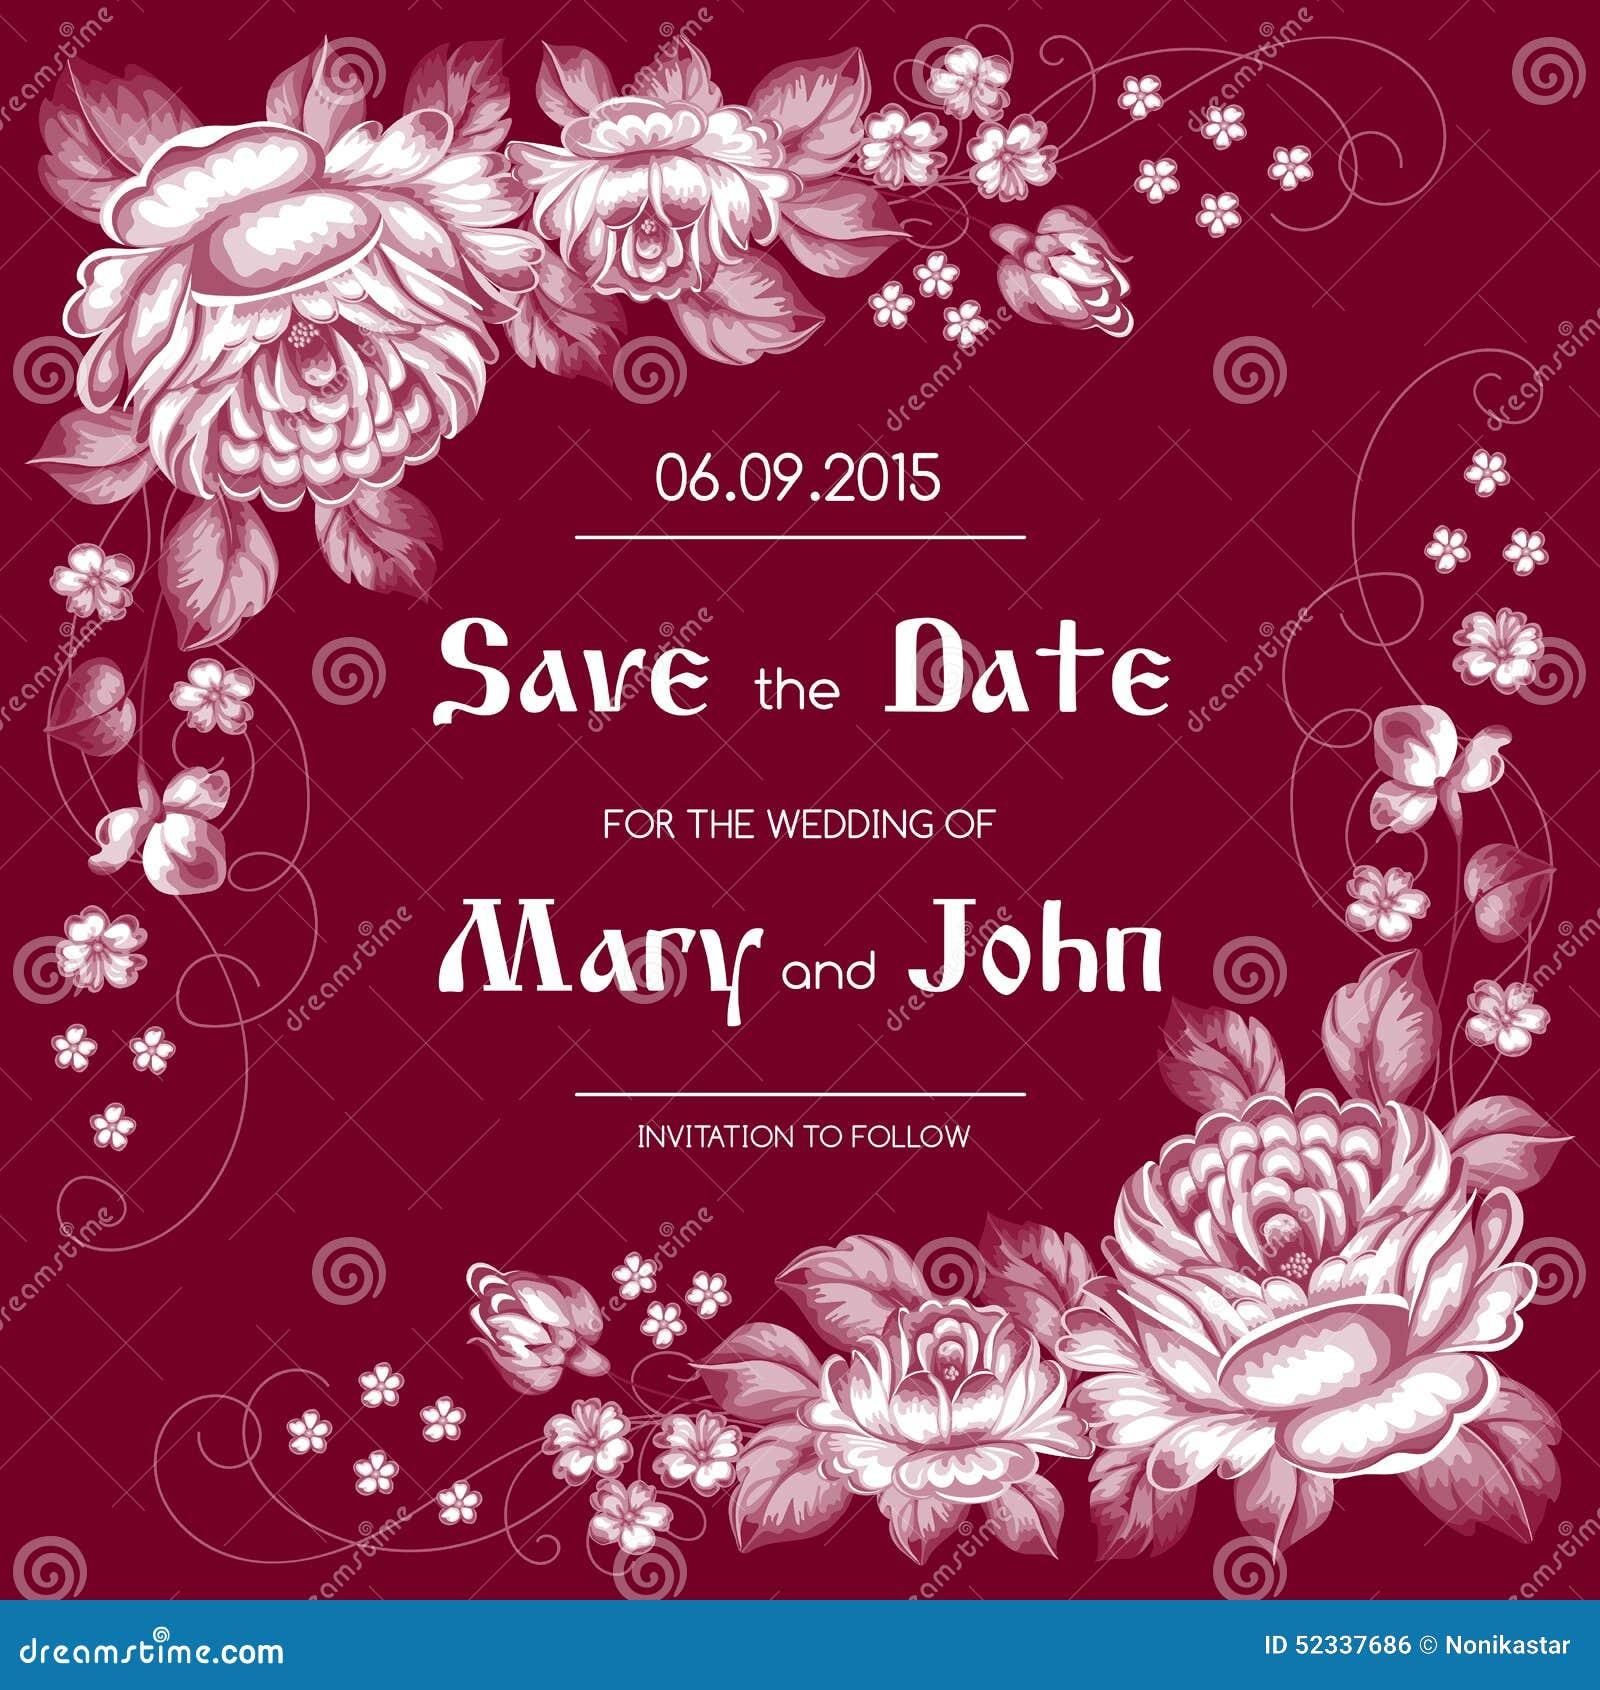 Russian Style Wedding Invitation Stock Vector - Illustration of ...